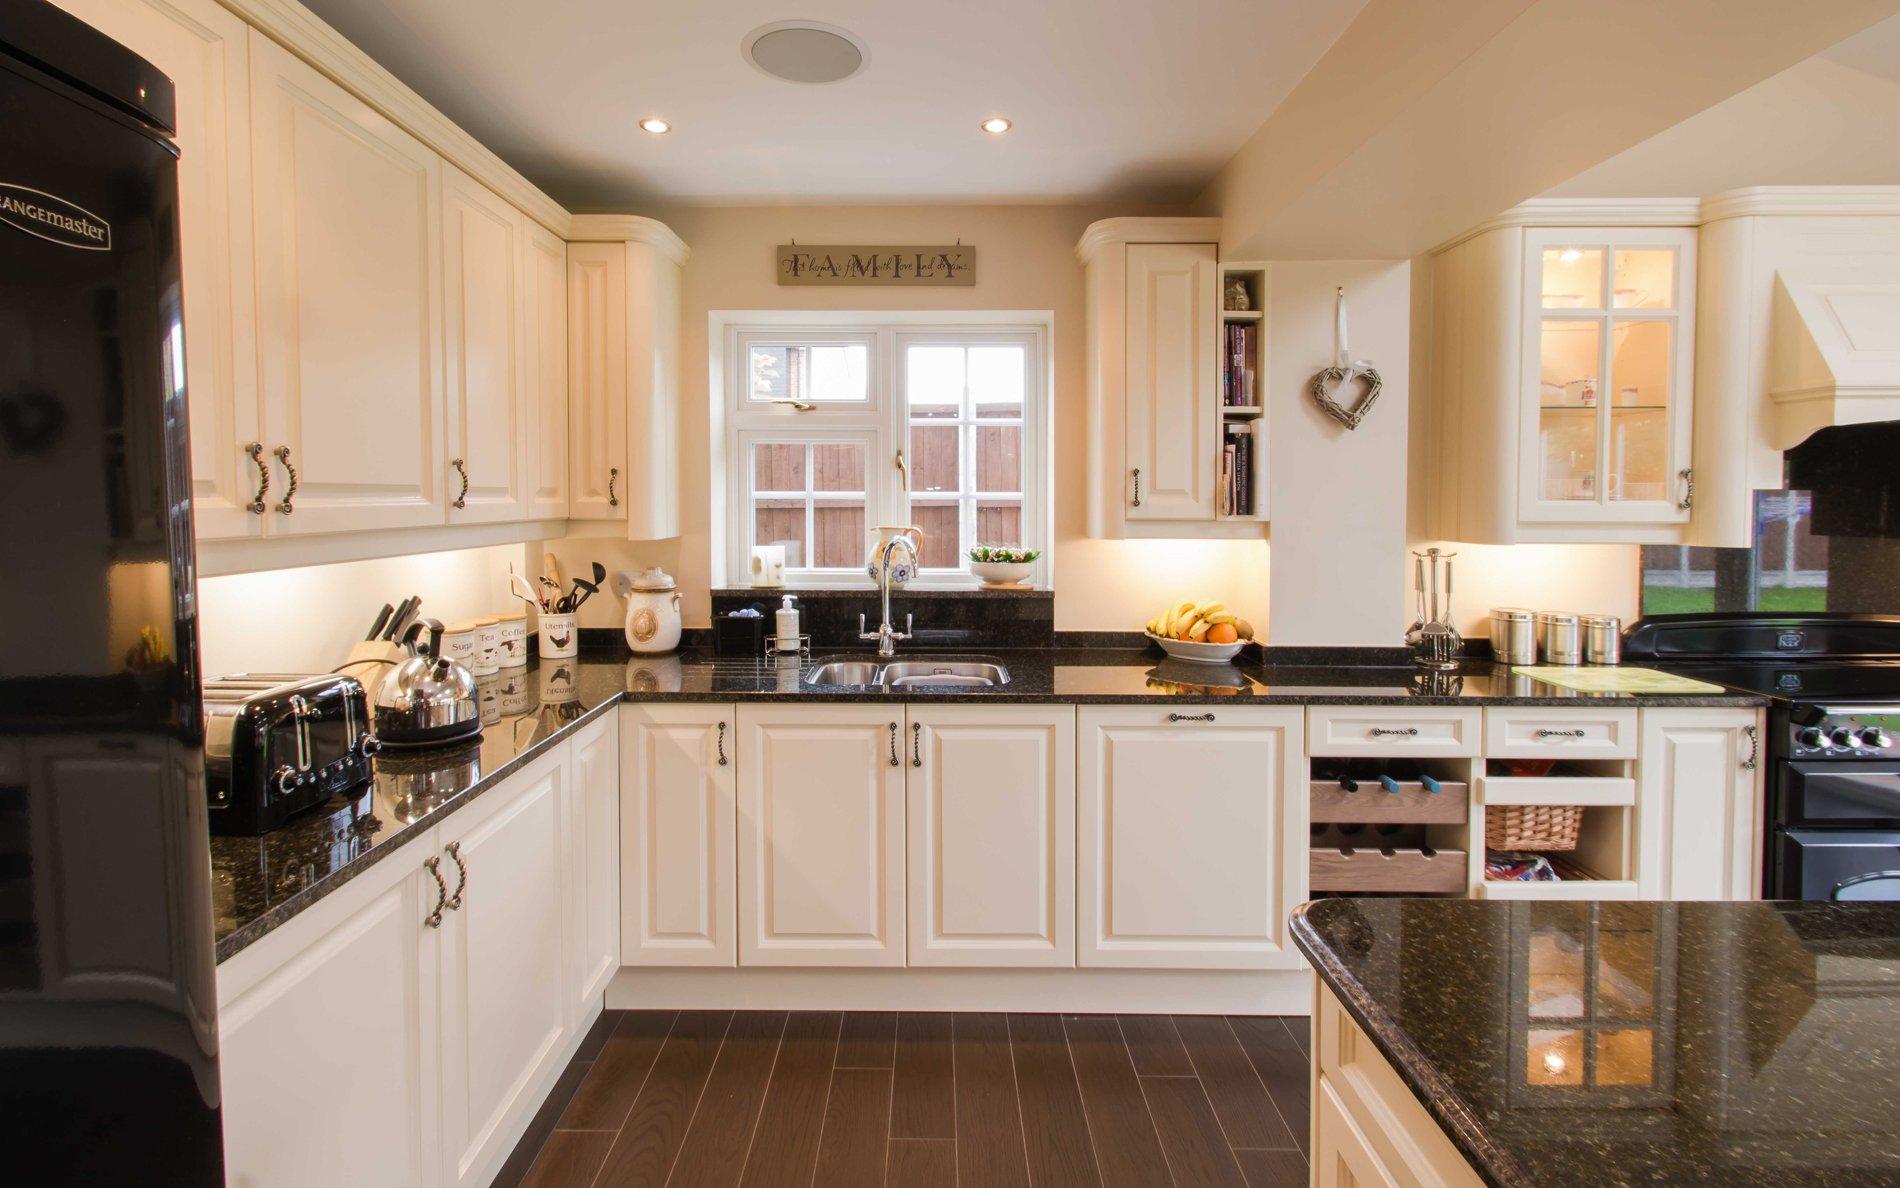 Little Cambridge Kitchen Design | Bespoke Kitchens |  Transforminteriors.co.uk